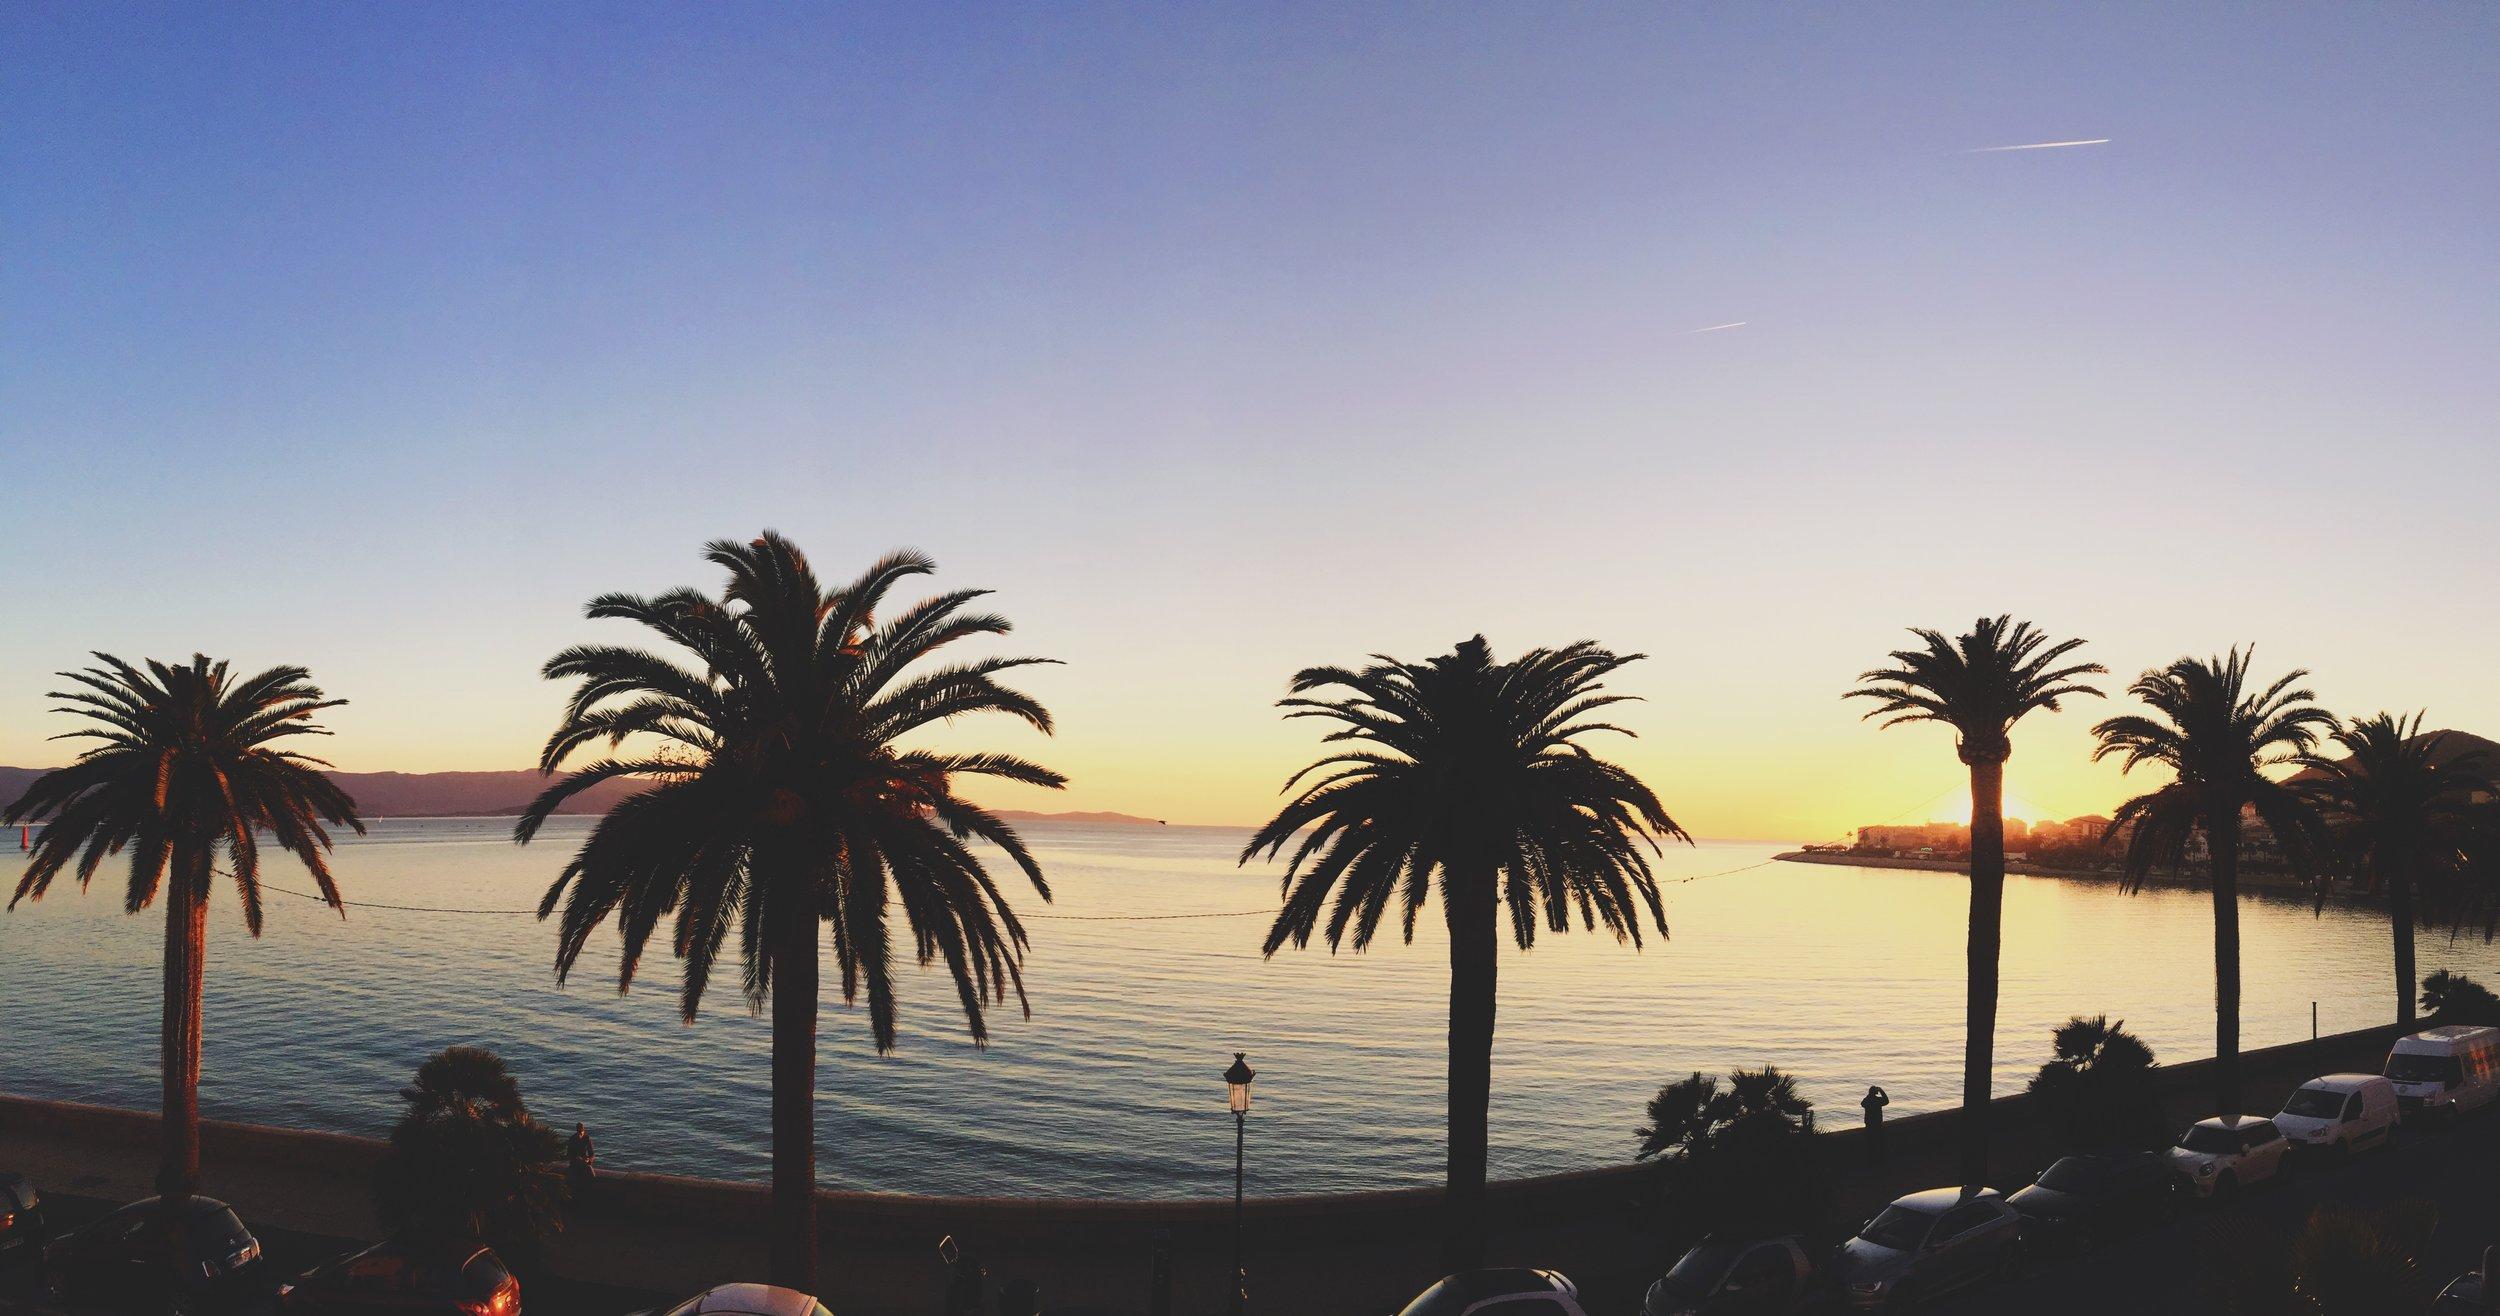 Ajaccio-corse-coucher-de-soleil.JPG